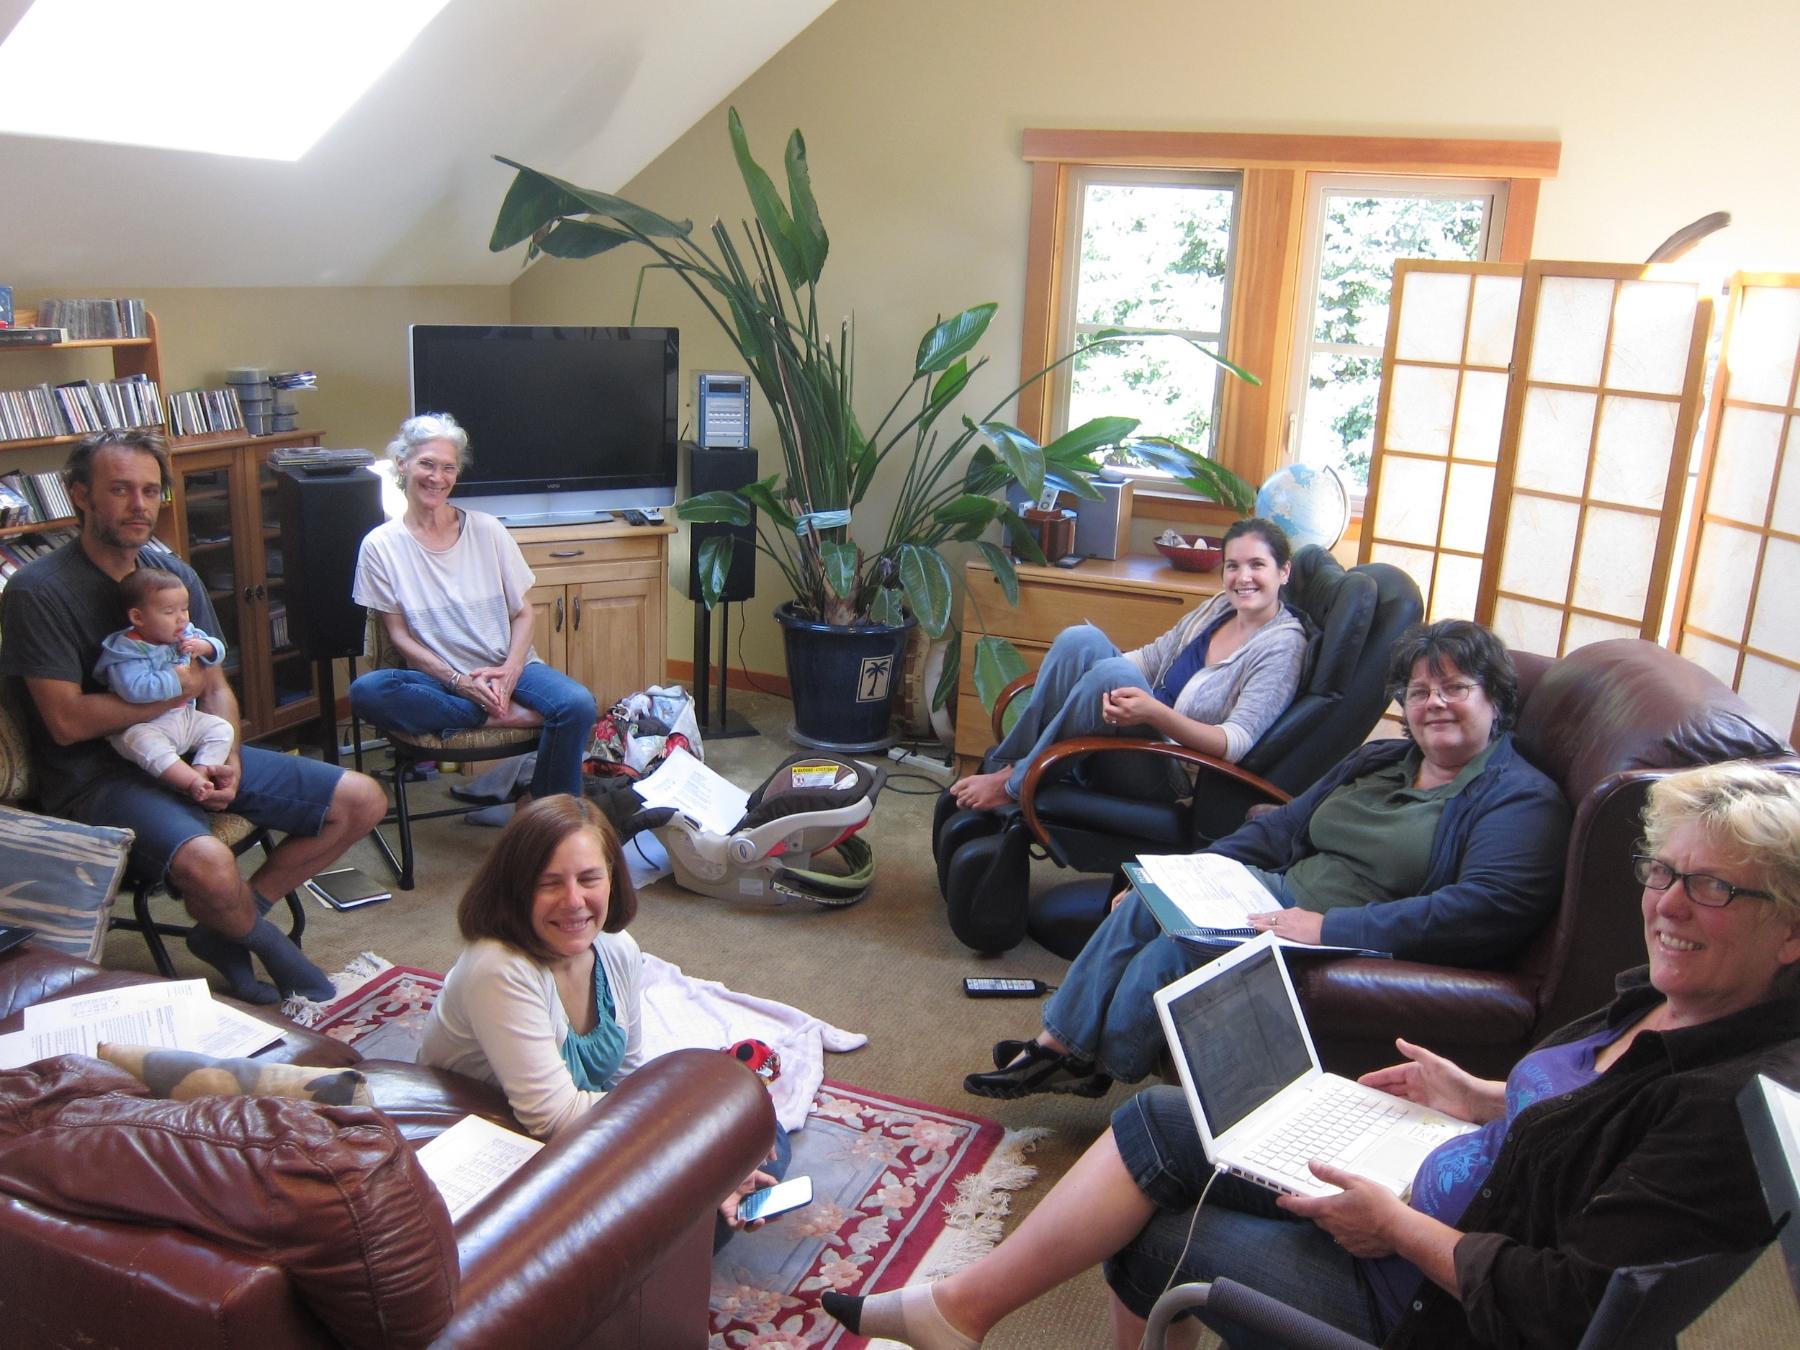 LIFE Board meeting, 2015  From left: Tom Phillips (pictured holding baby); Laura Winds; Tess Winds-Johnson, Diane Harper; Jennifer Bernard; Julie Hunter.